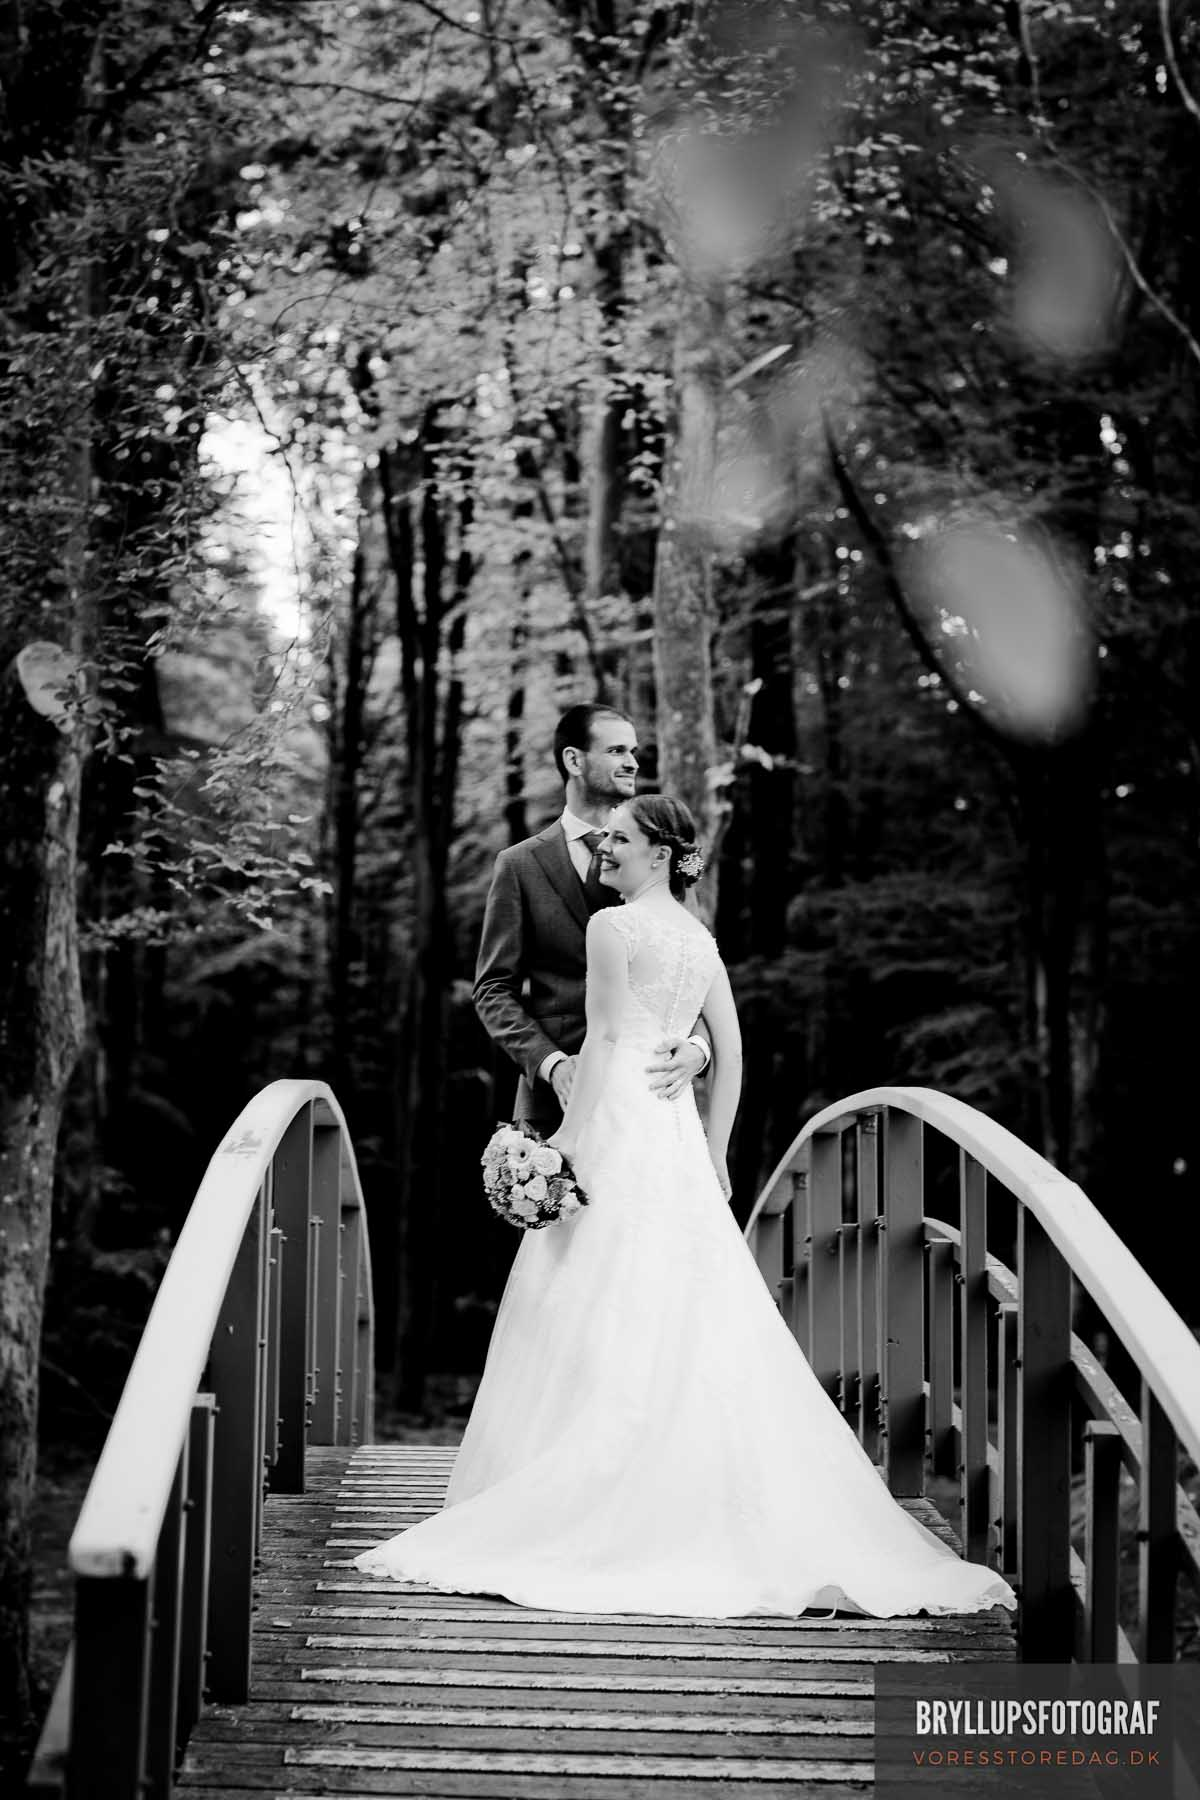 bryllupsfotografering Skarrildhus